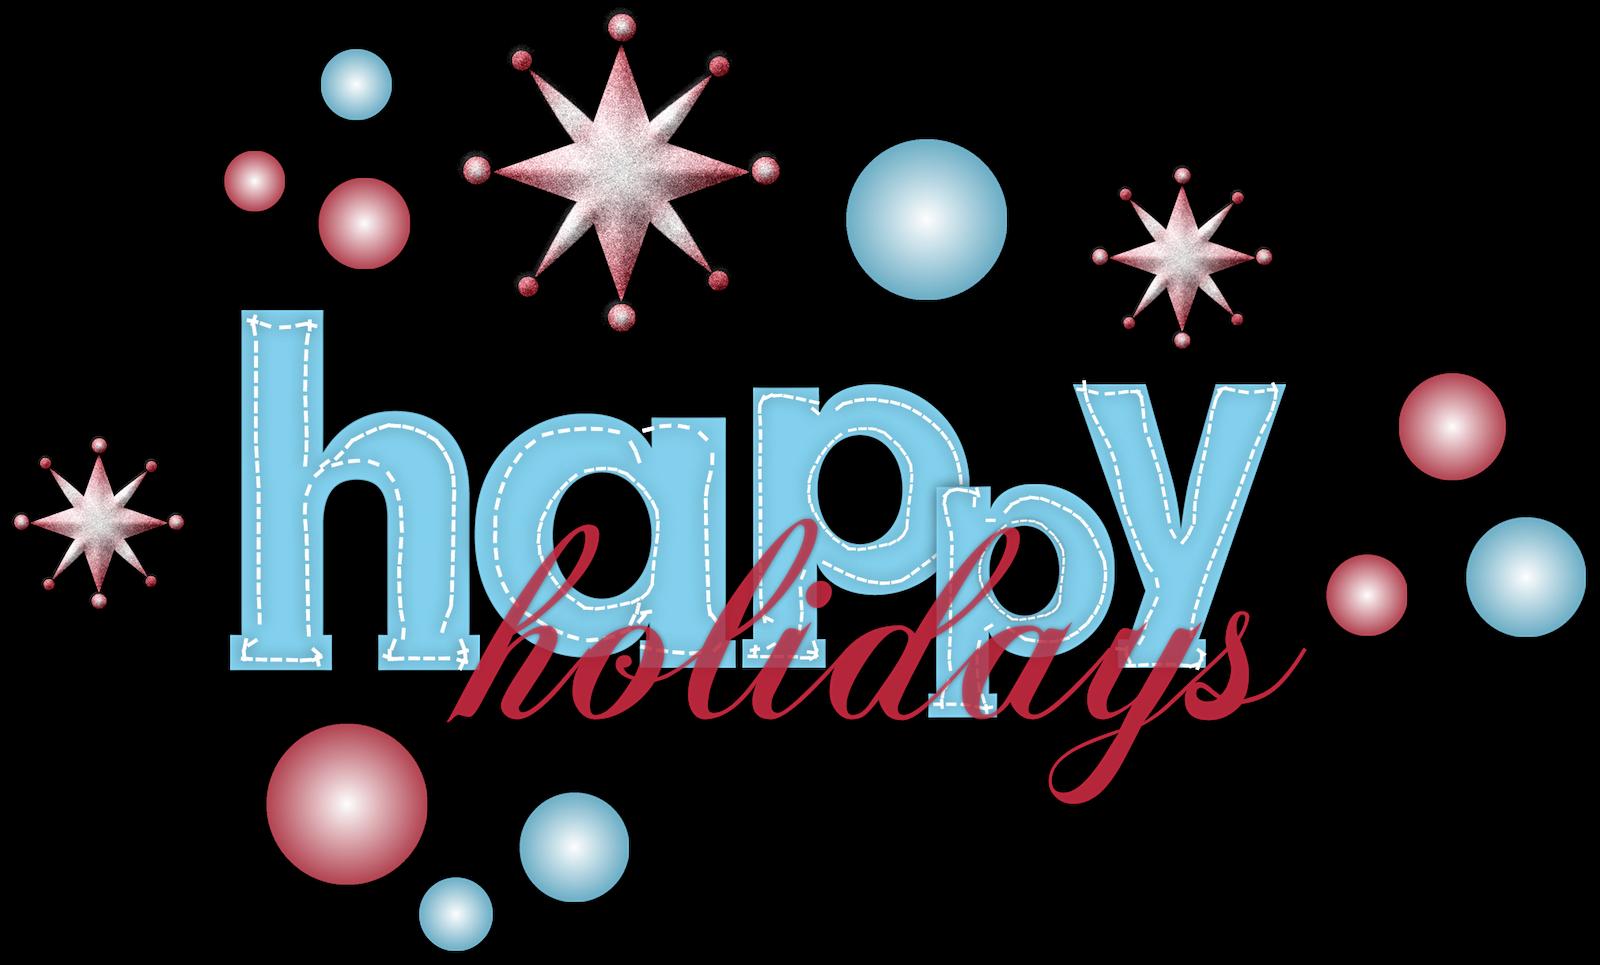 Word clipart happy holiday Free Happy com holidays clipart